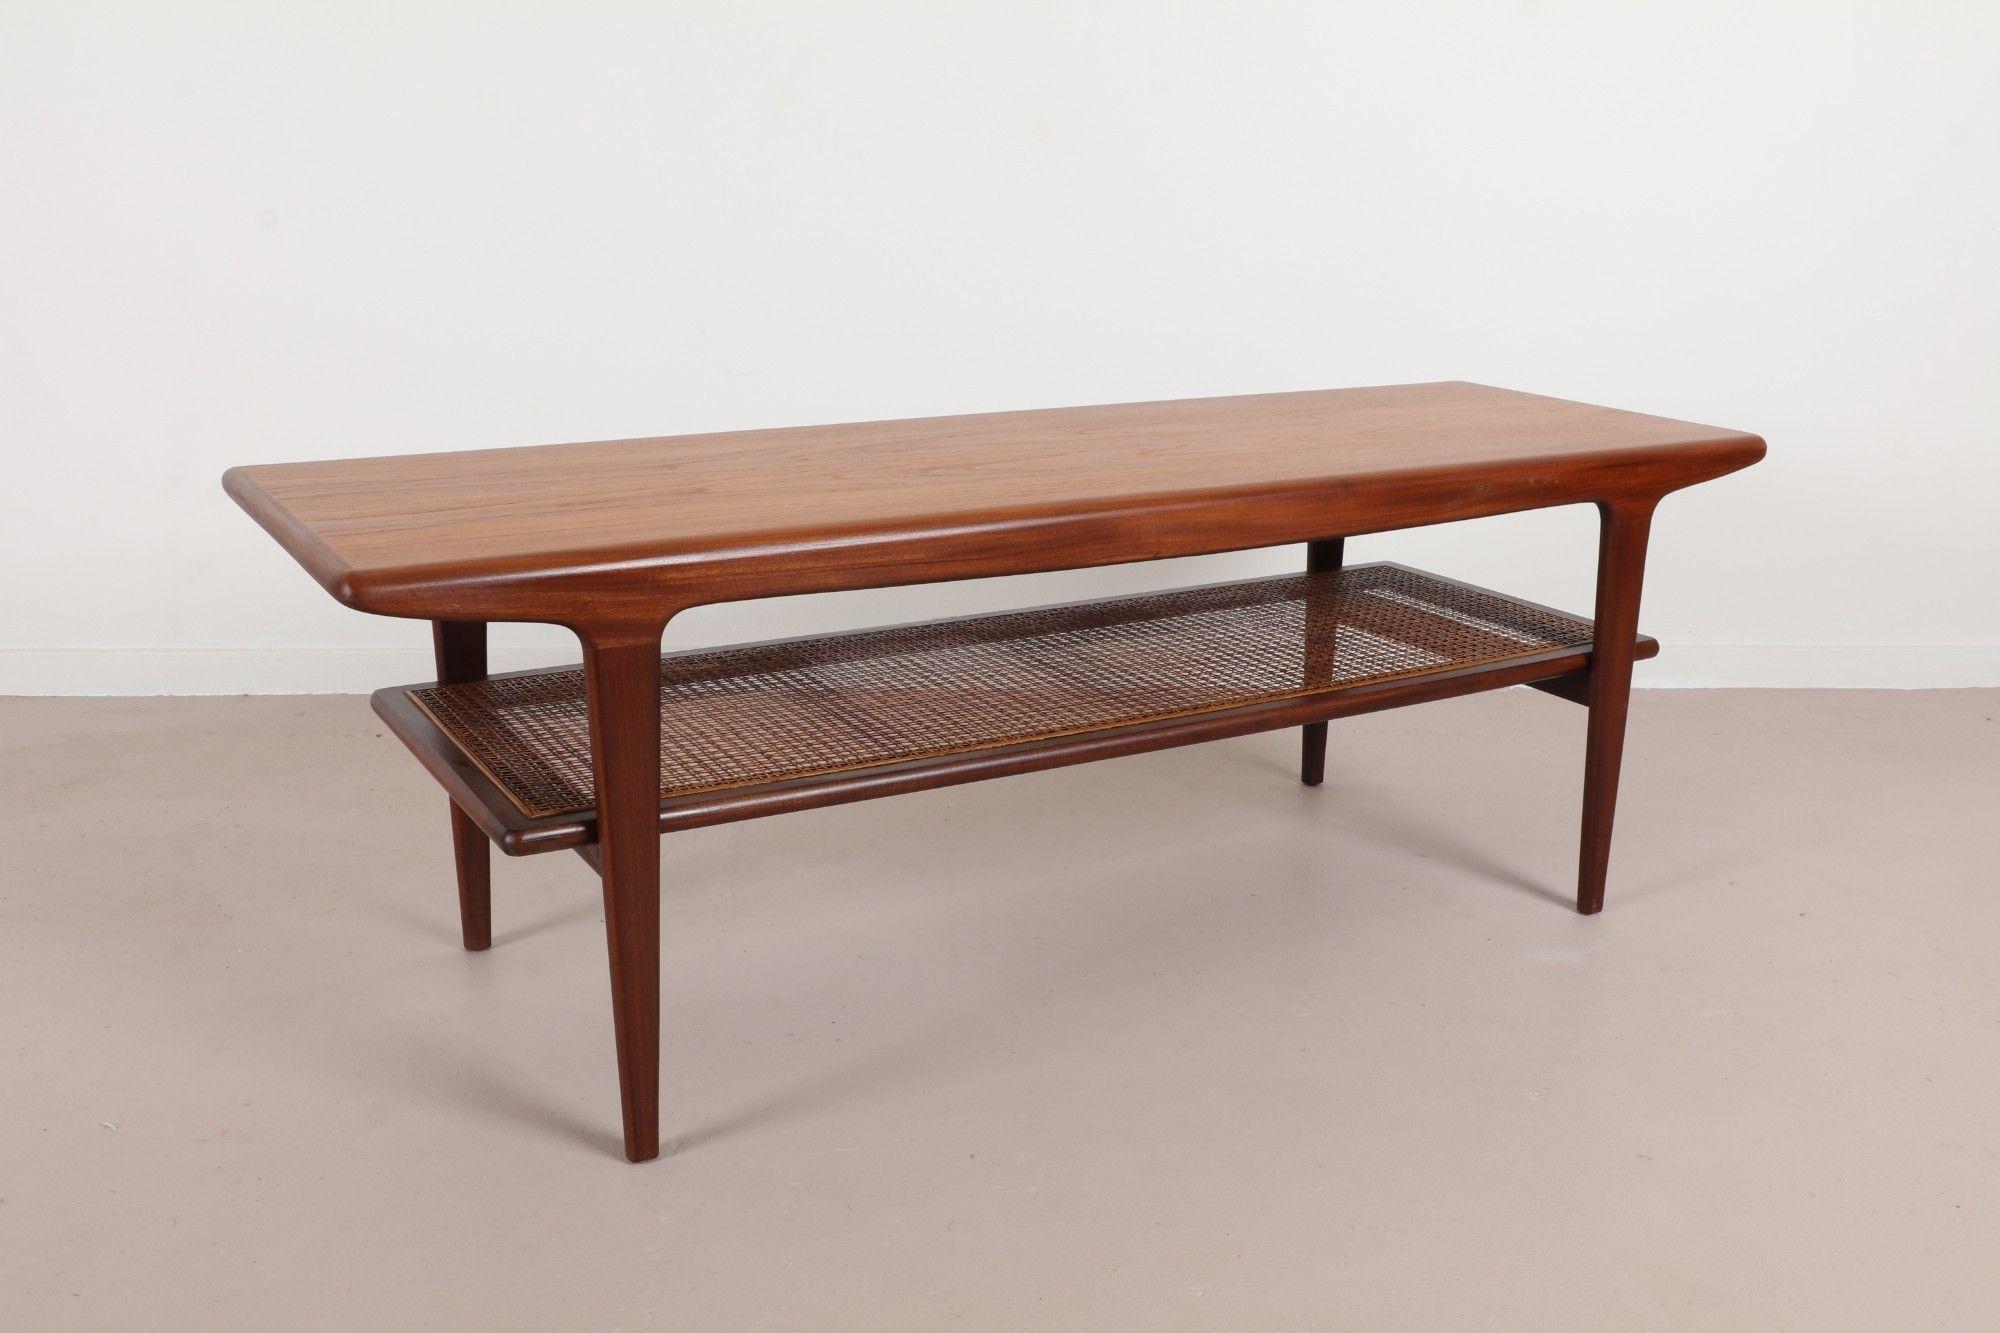 Retro Scandinavian Teak Coffee Side Table Vintage Mid Century Modern Danish Design Hvidt Style Mid Century Coffee Table Coffee Table Modern Patio Furniture [ 768 x 1024 Pixel ]